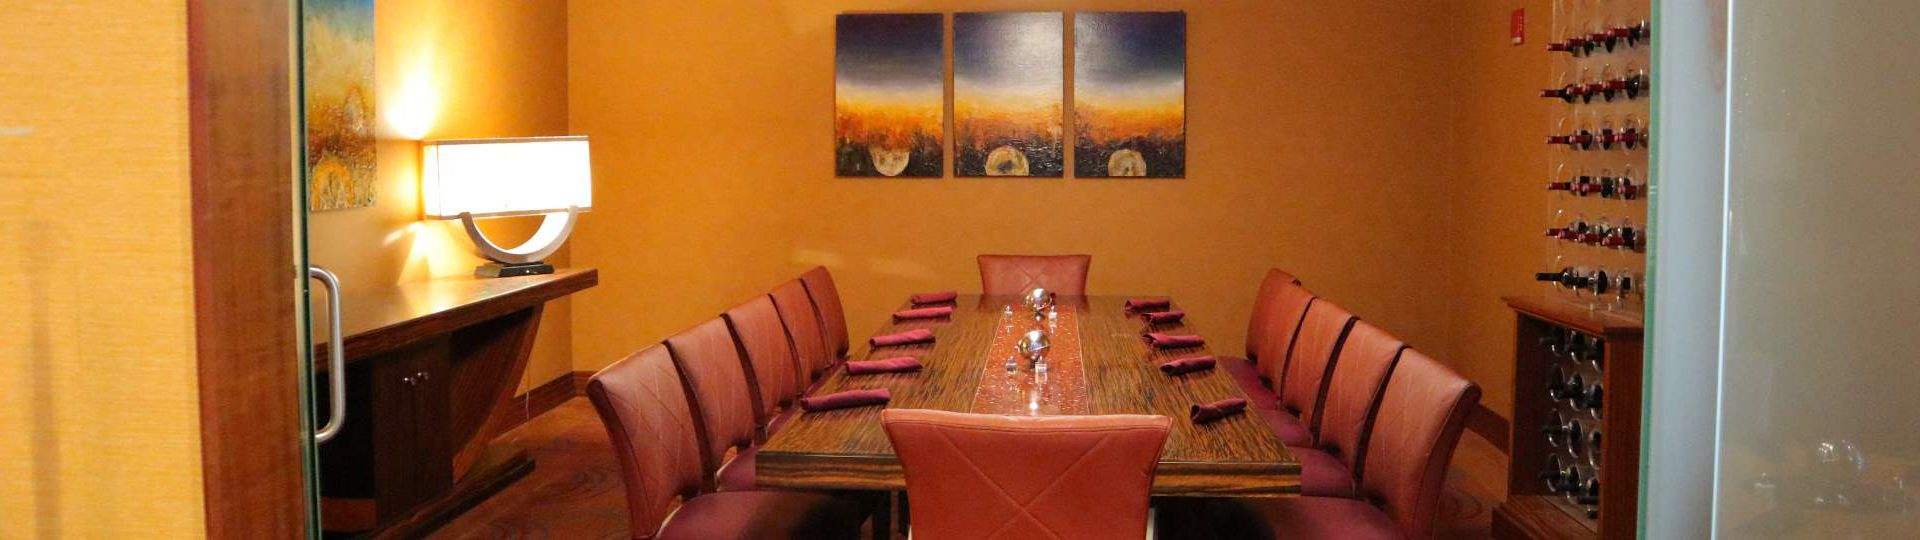 Luna Restaurant & Lounge, Florida - Private Dining